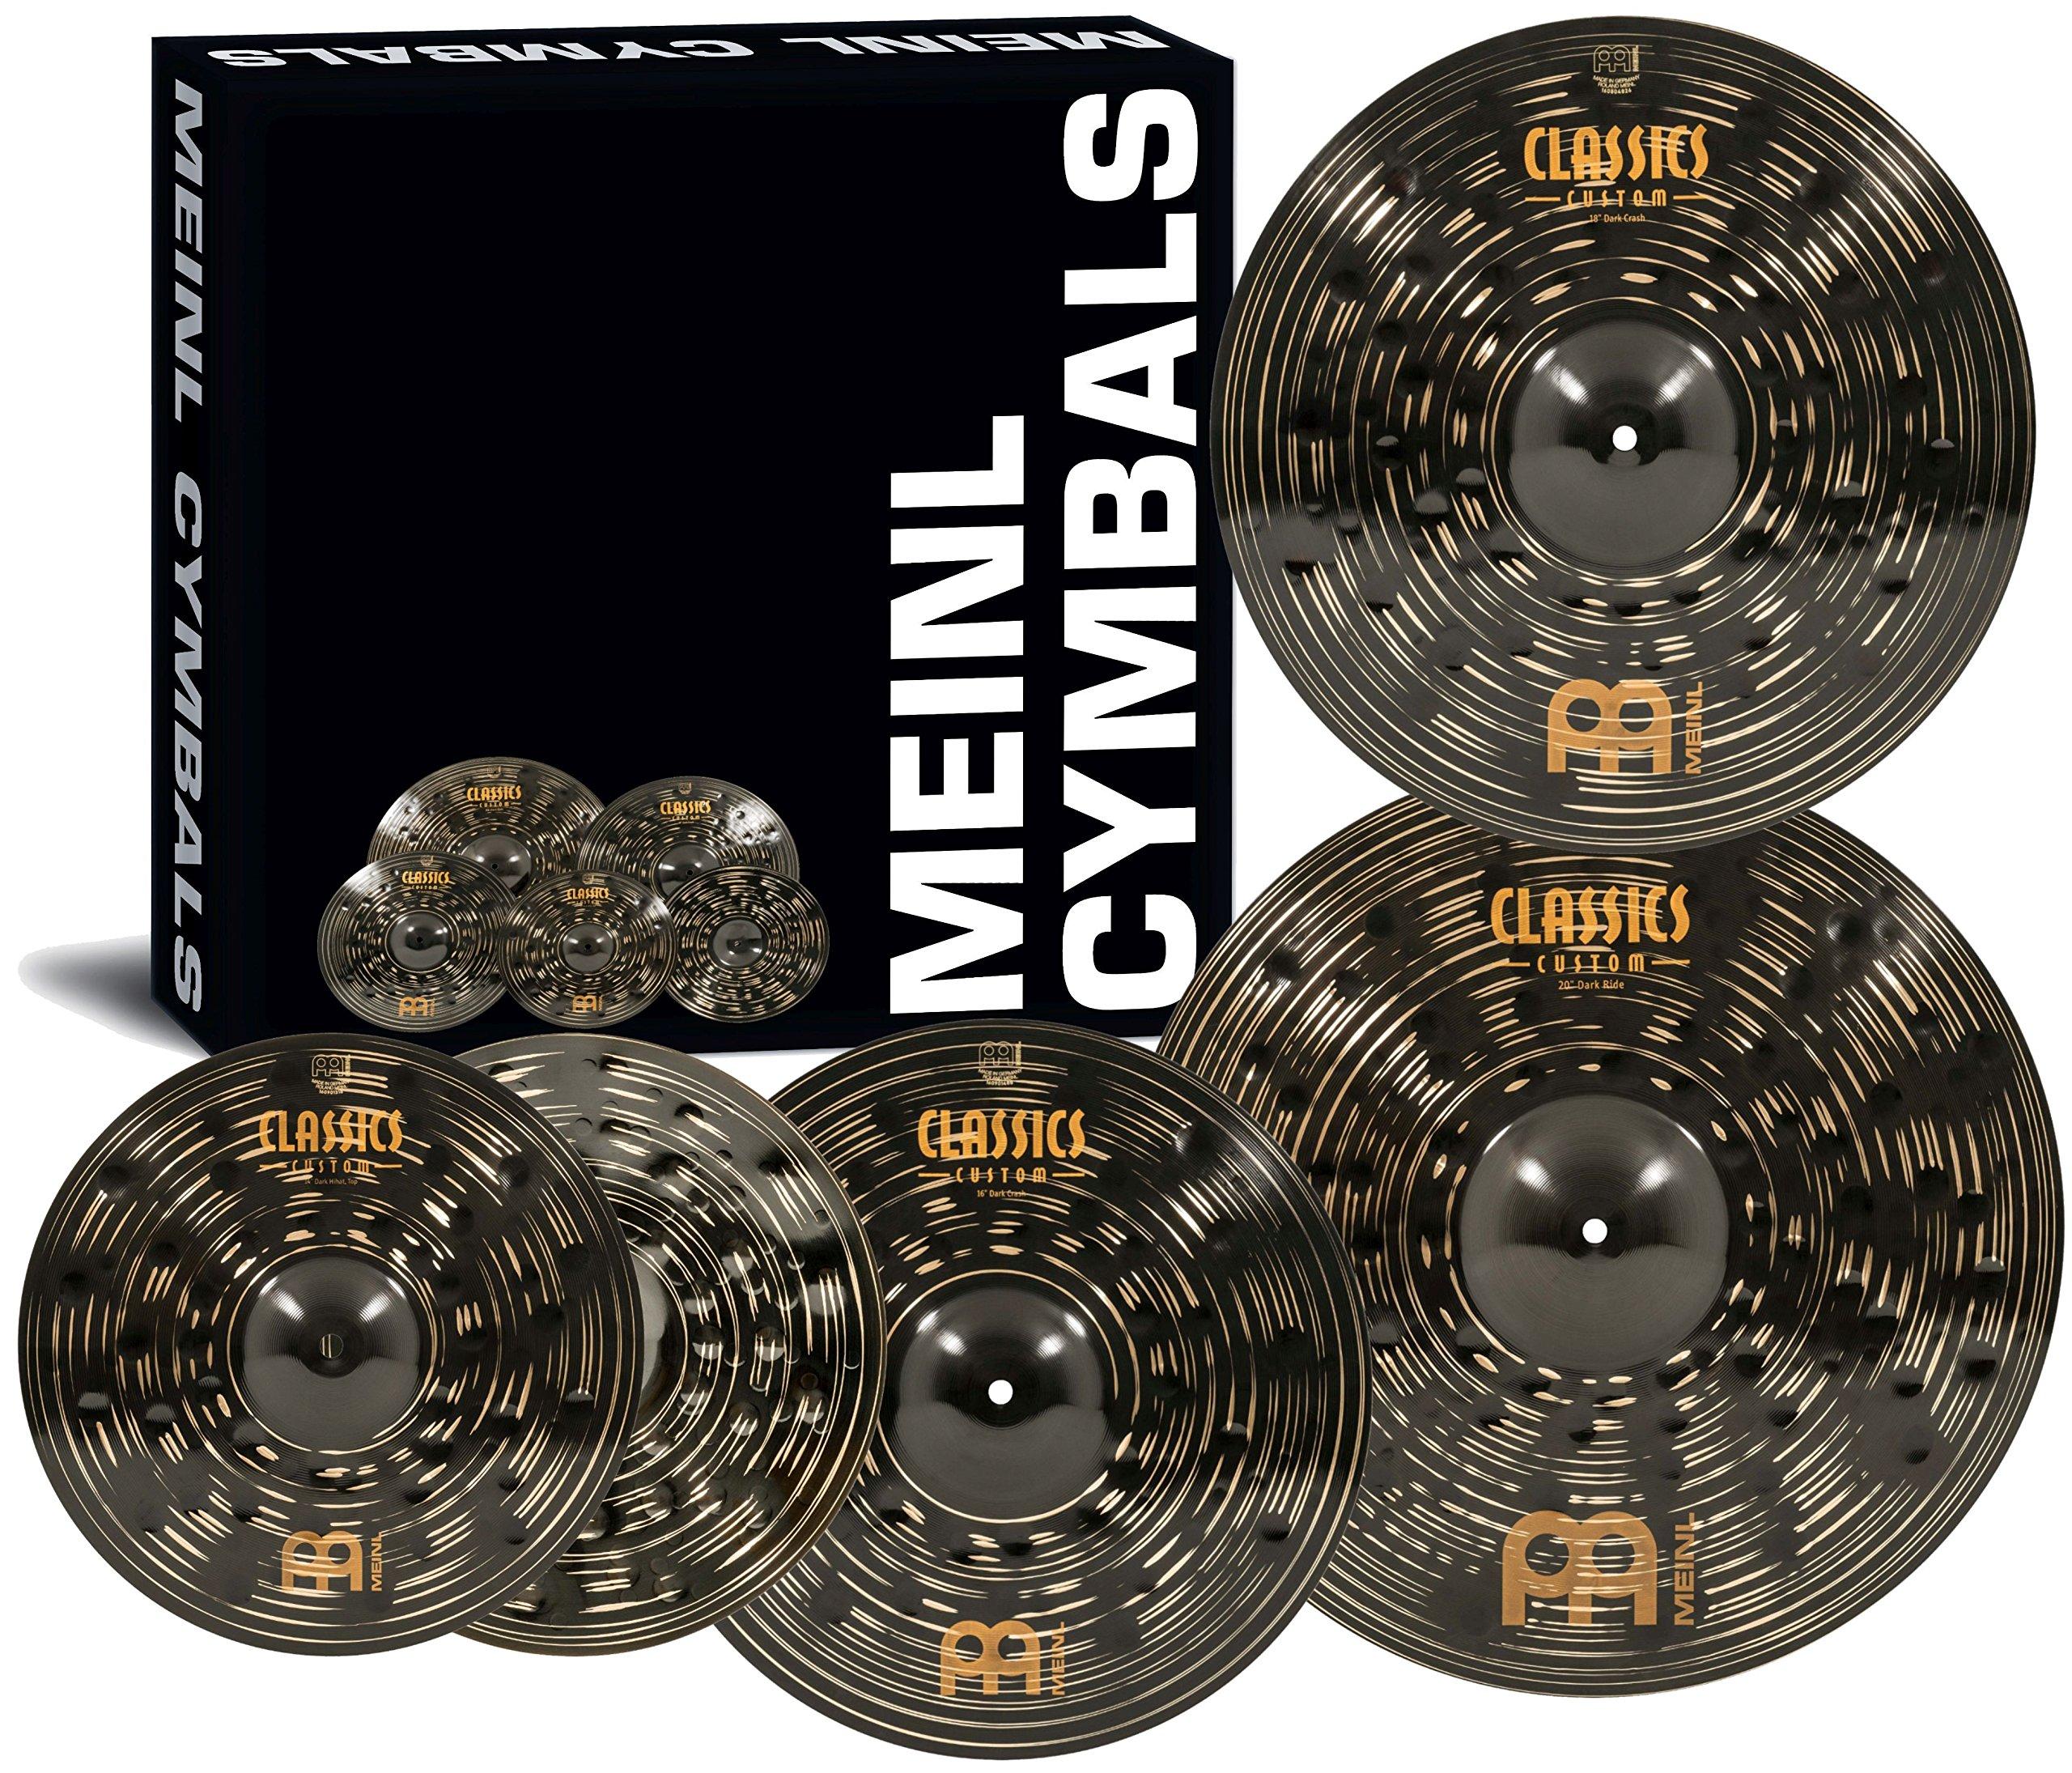 Meinl Cymbals CCD460+18 Classics Custom Dark Pack Bonus Cymbal Box Set with FREE 18'' Dark Crash (VIDEO)